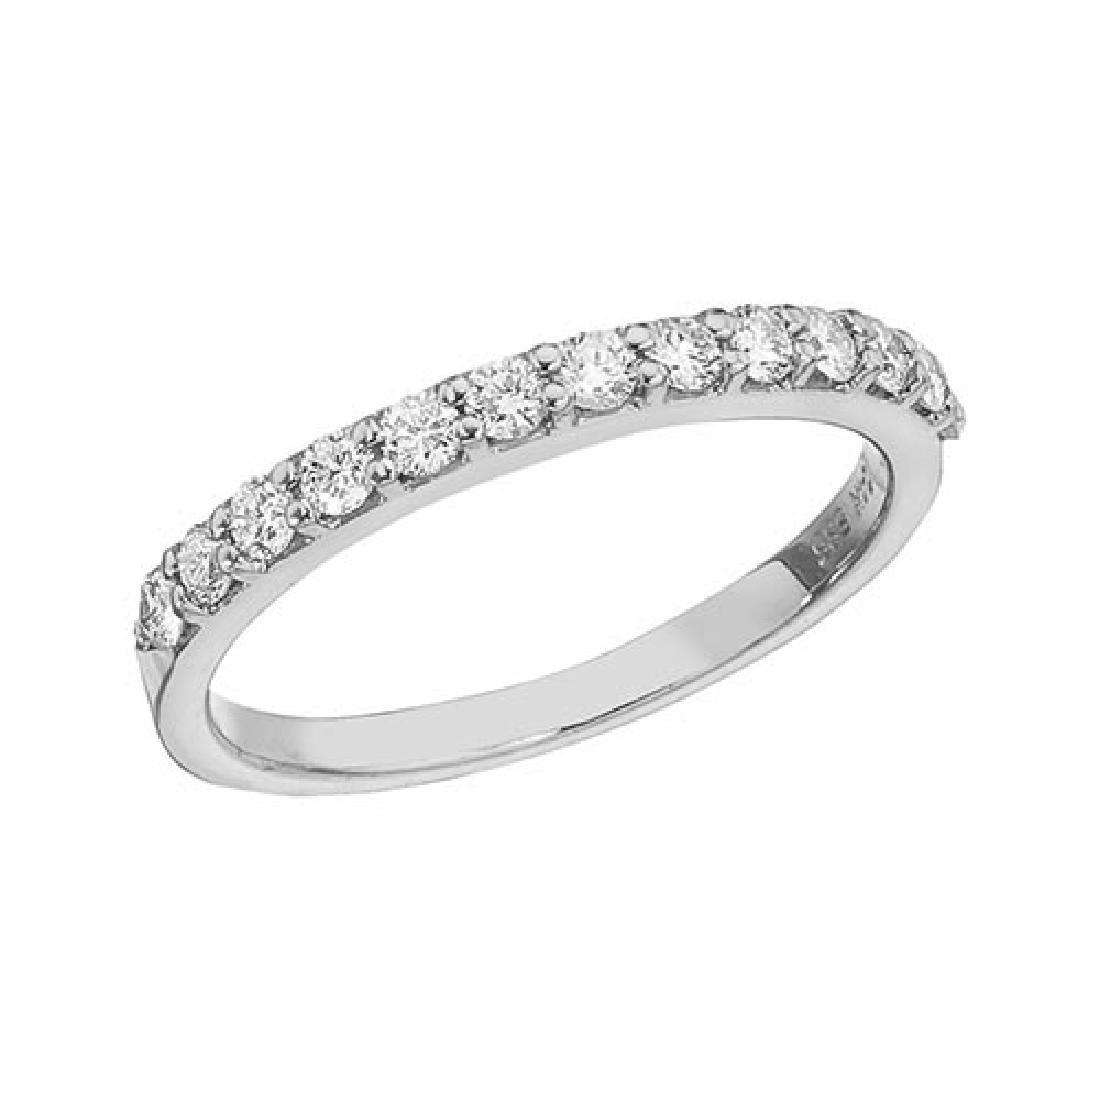 Certified 14K White Gold Diamond Diamond Band Ring